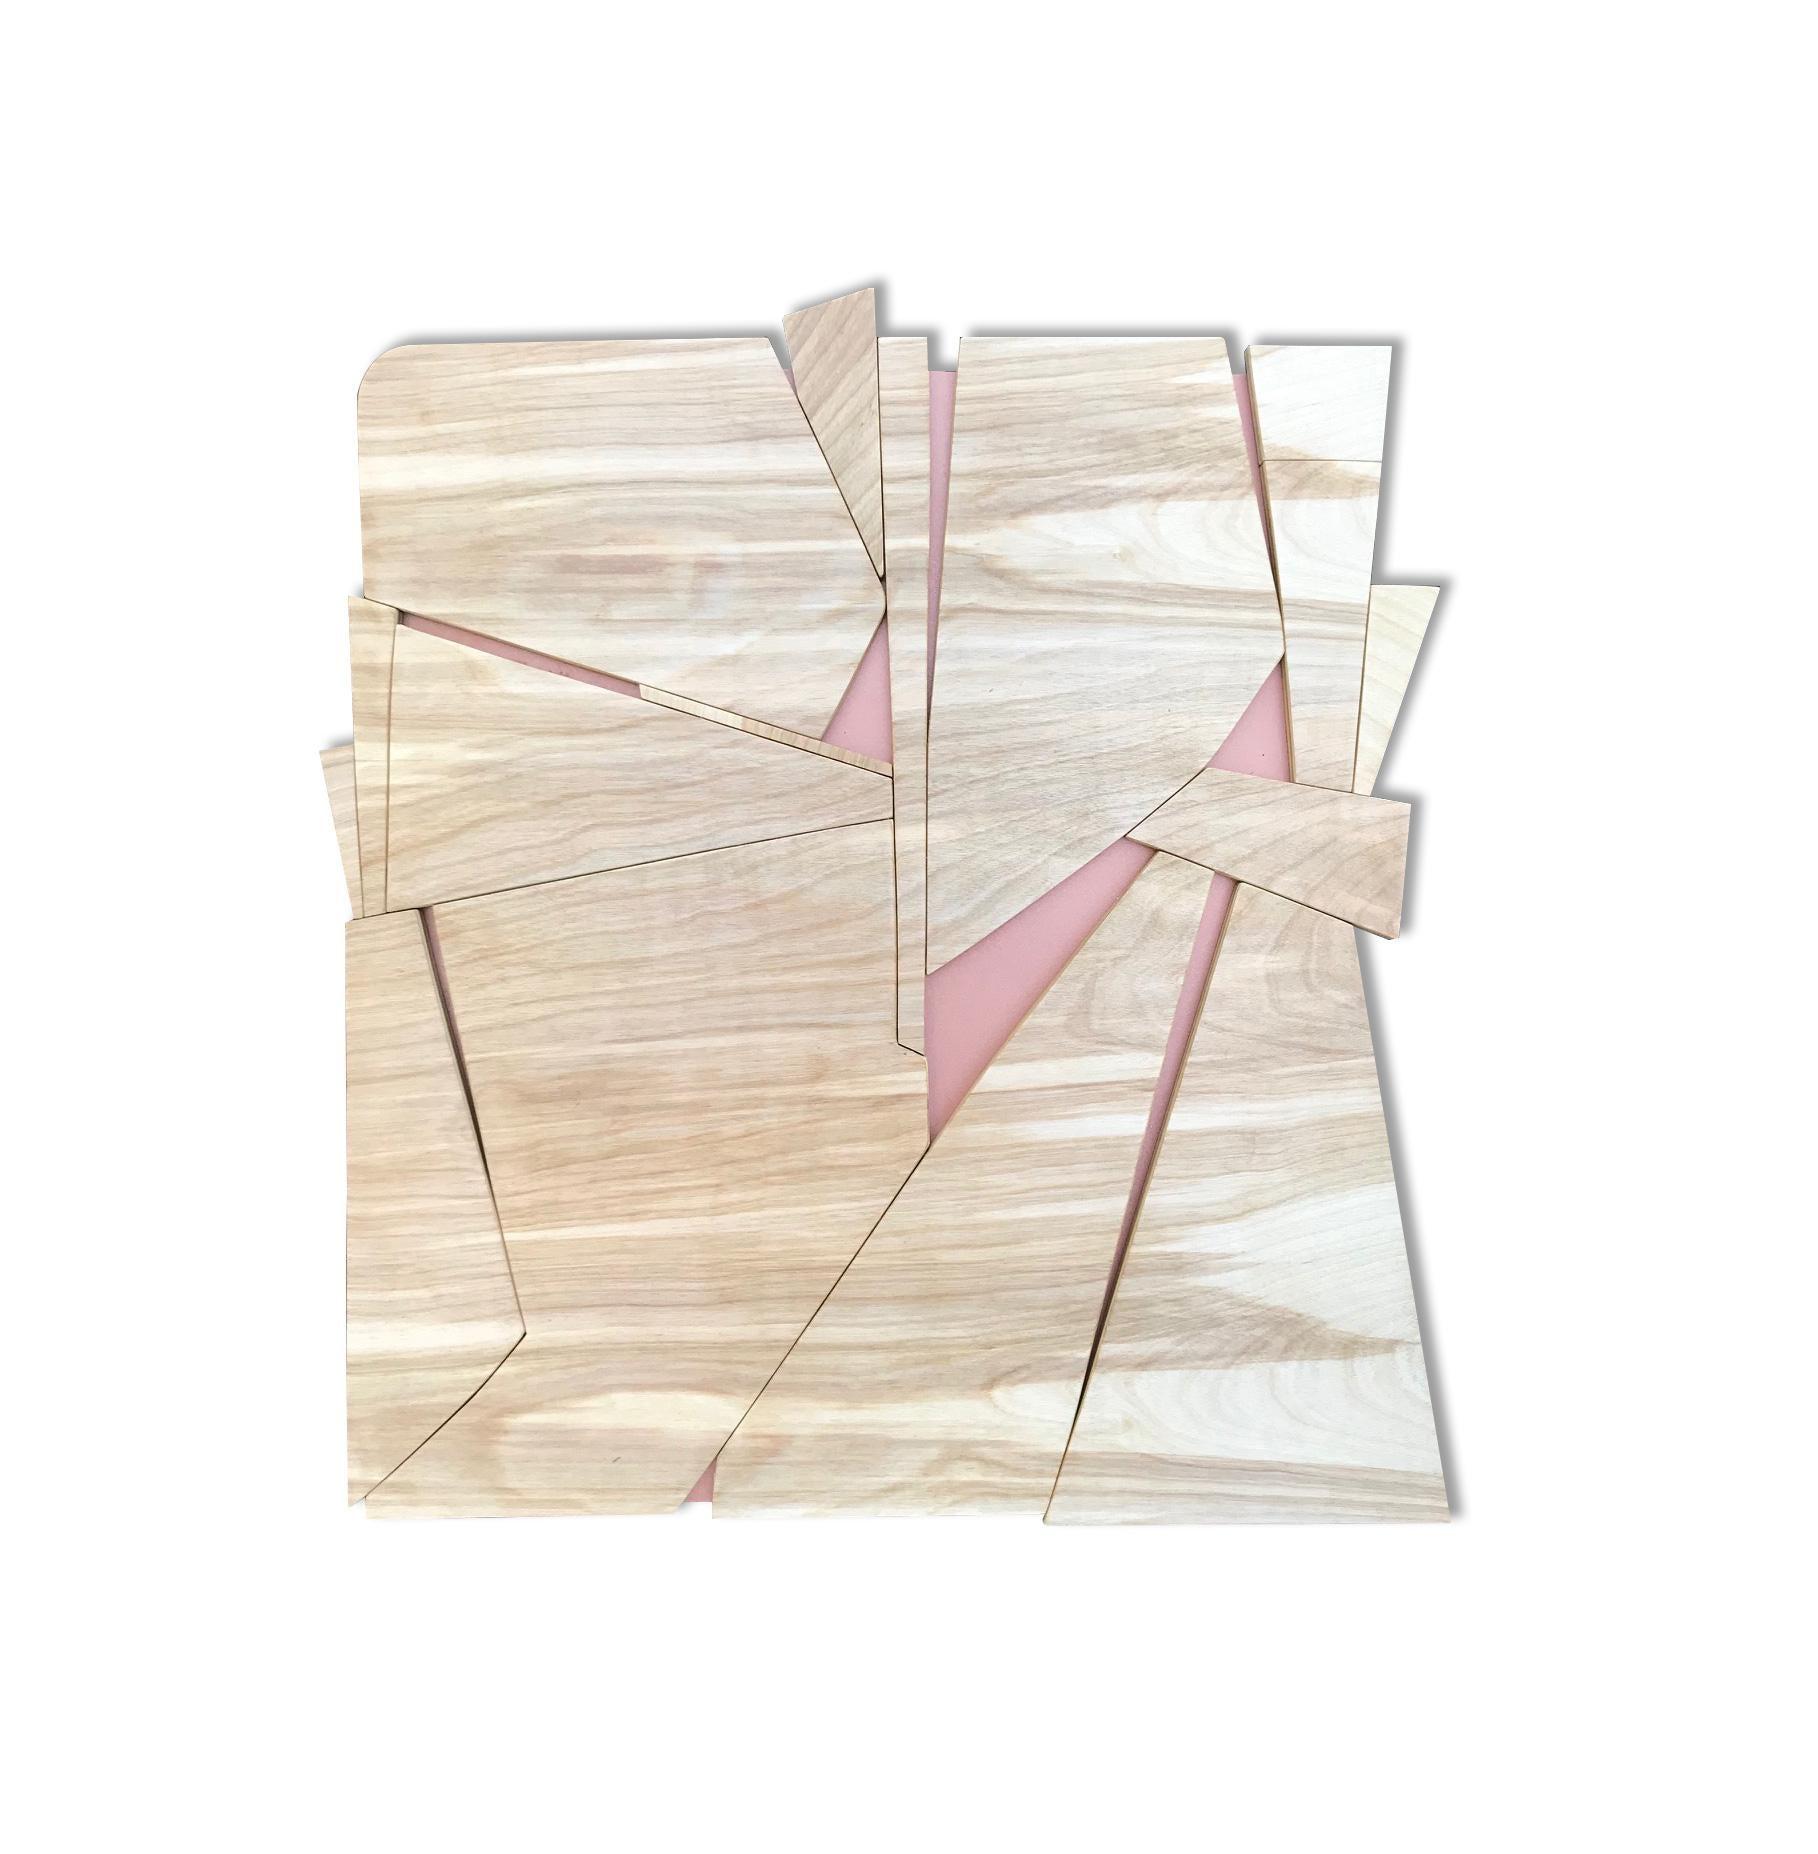 Zephyr II (monochrome abstract sculpture minimal geometric design natural wood)